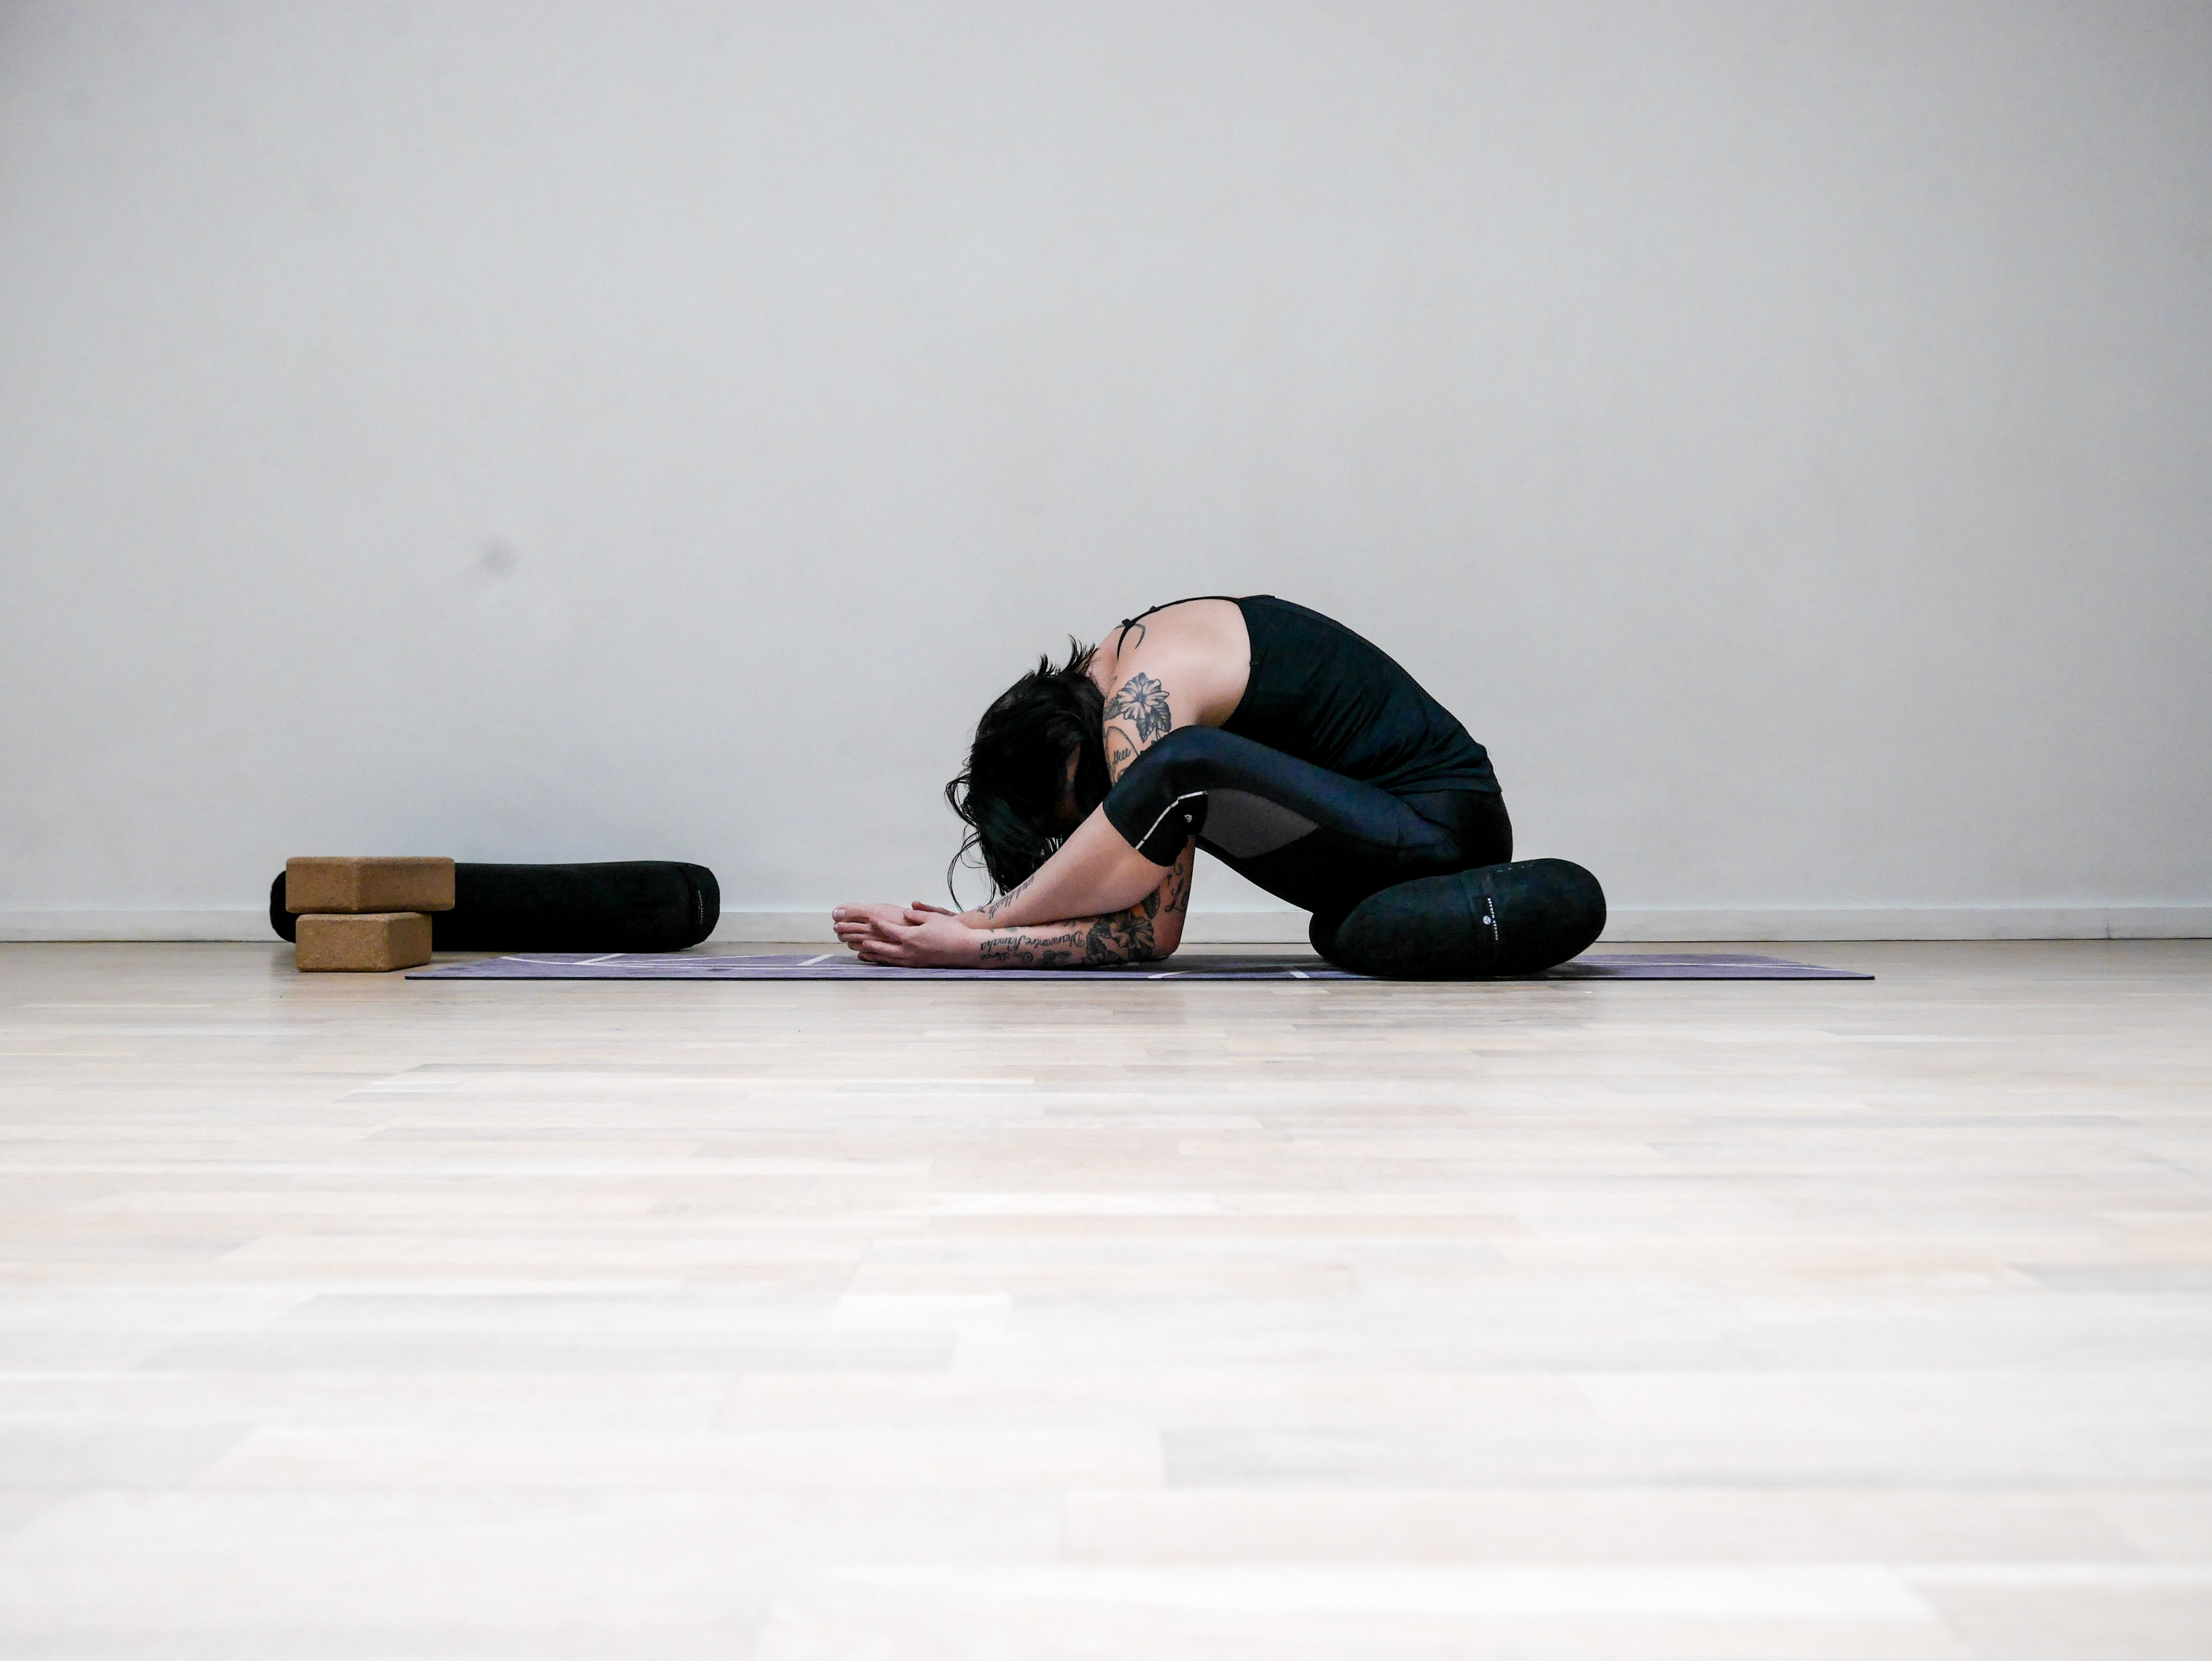 YOGAUTMANING Dag 25  Framåtfällningar - Josefines Yoga - Metro Mode a778401461e80